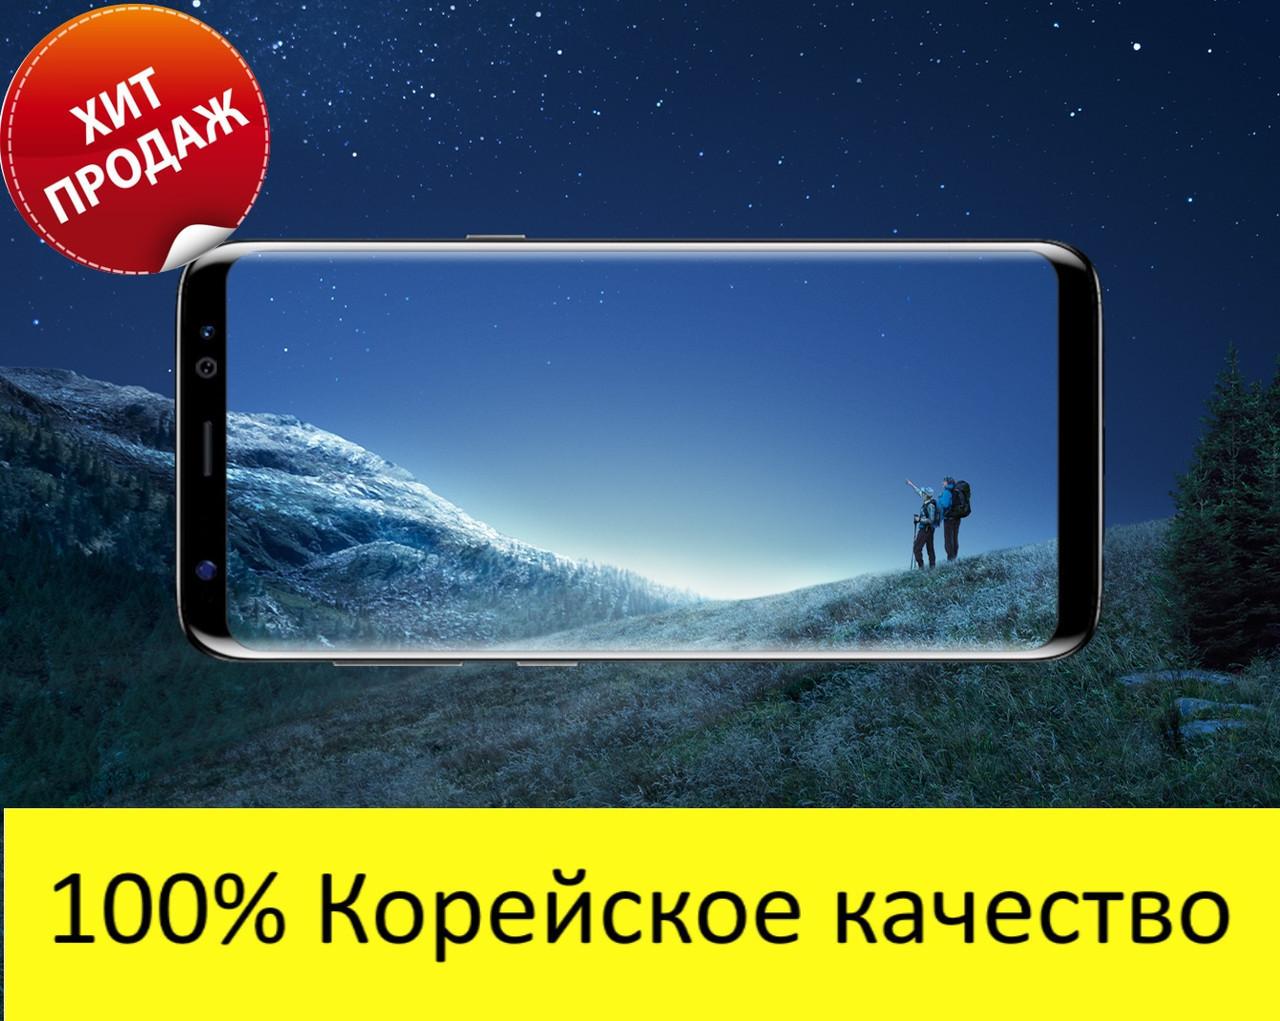 Samsung Galaxy S9 64Gb! 3G! GPS ! 8-Ядер! Гарантия ! копия самсунг s6/s8/s5/s4/s3/j7